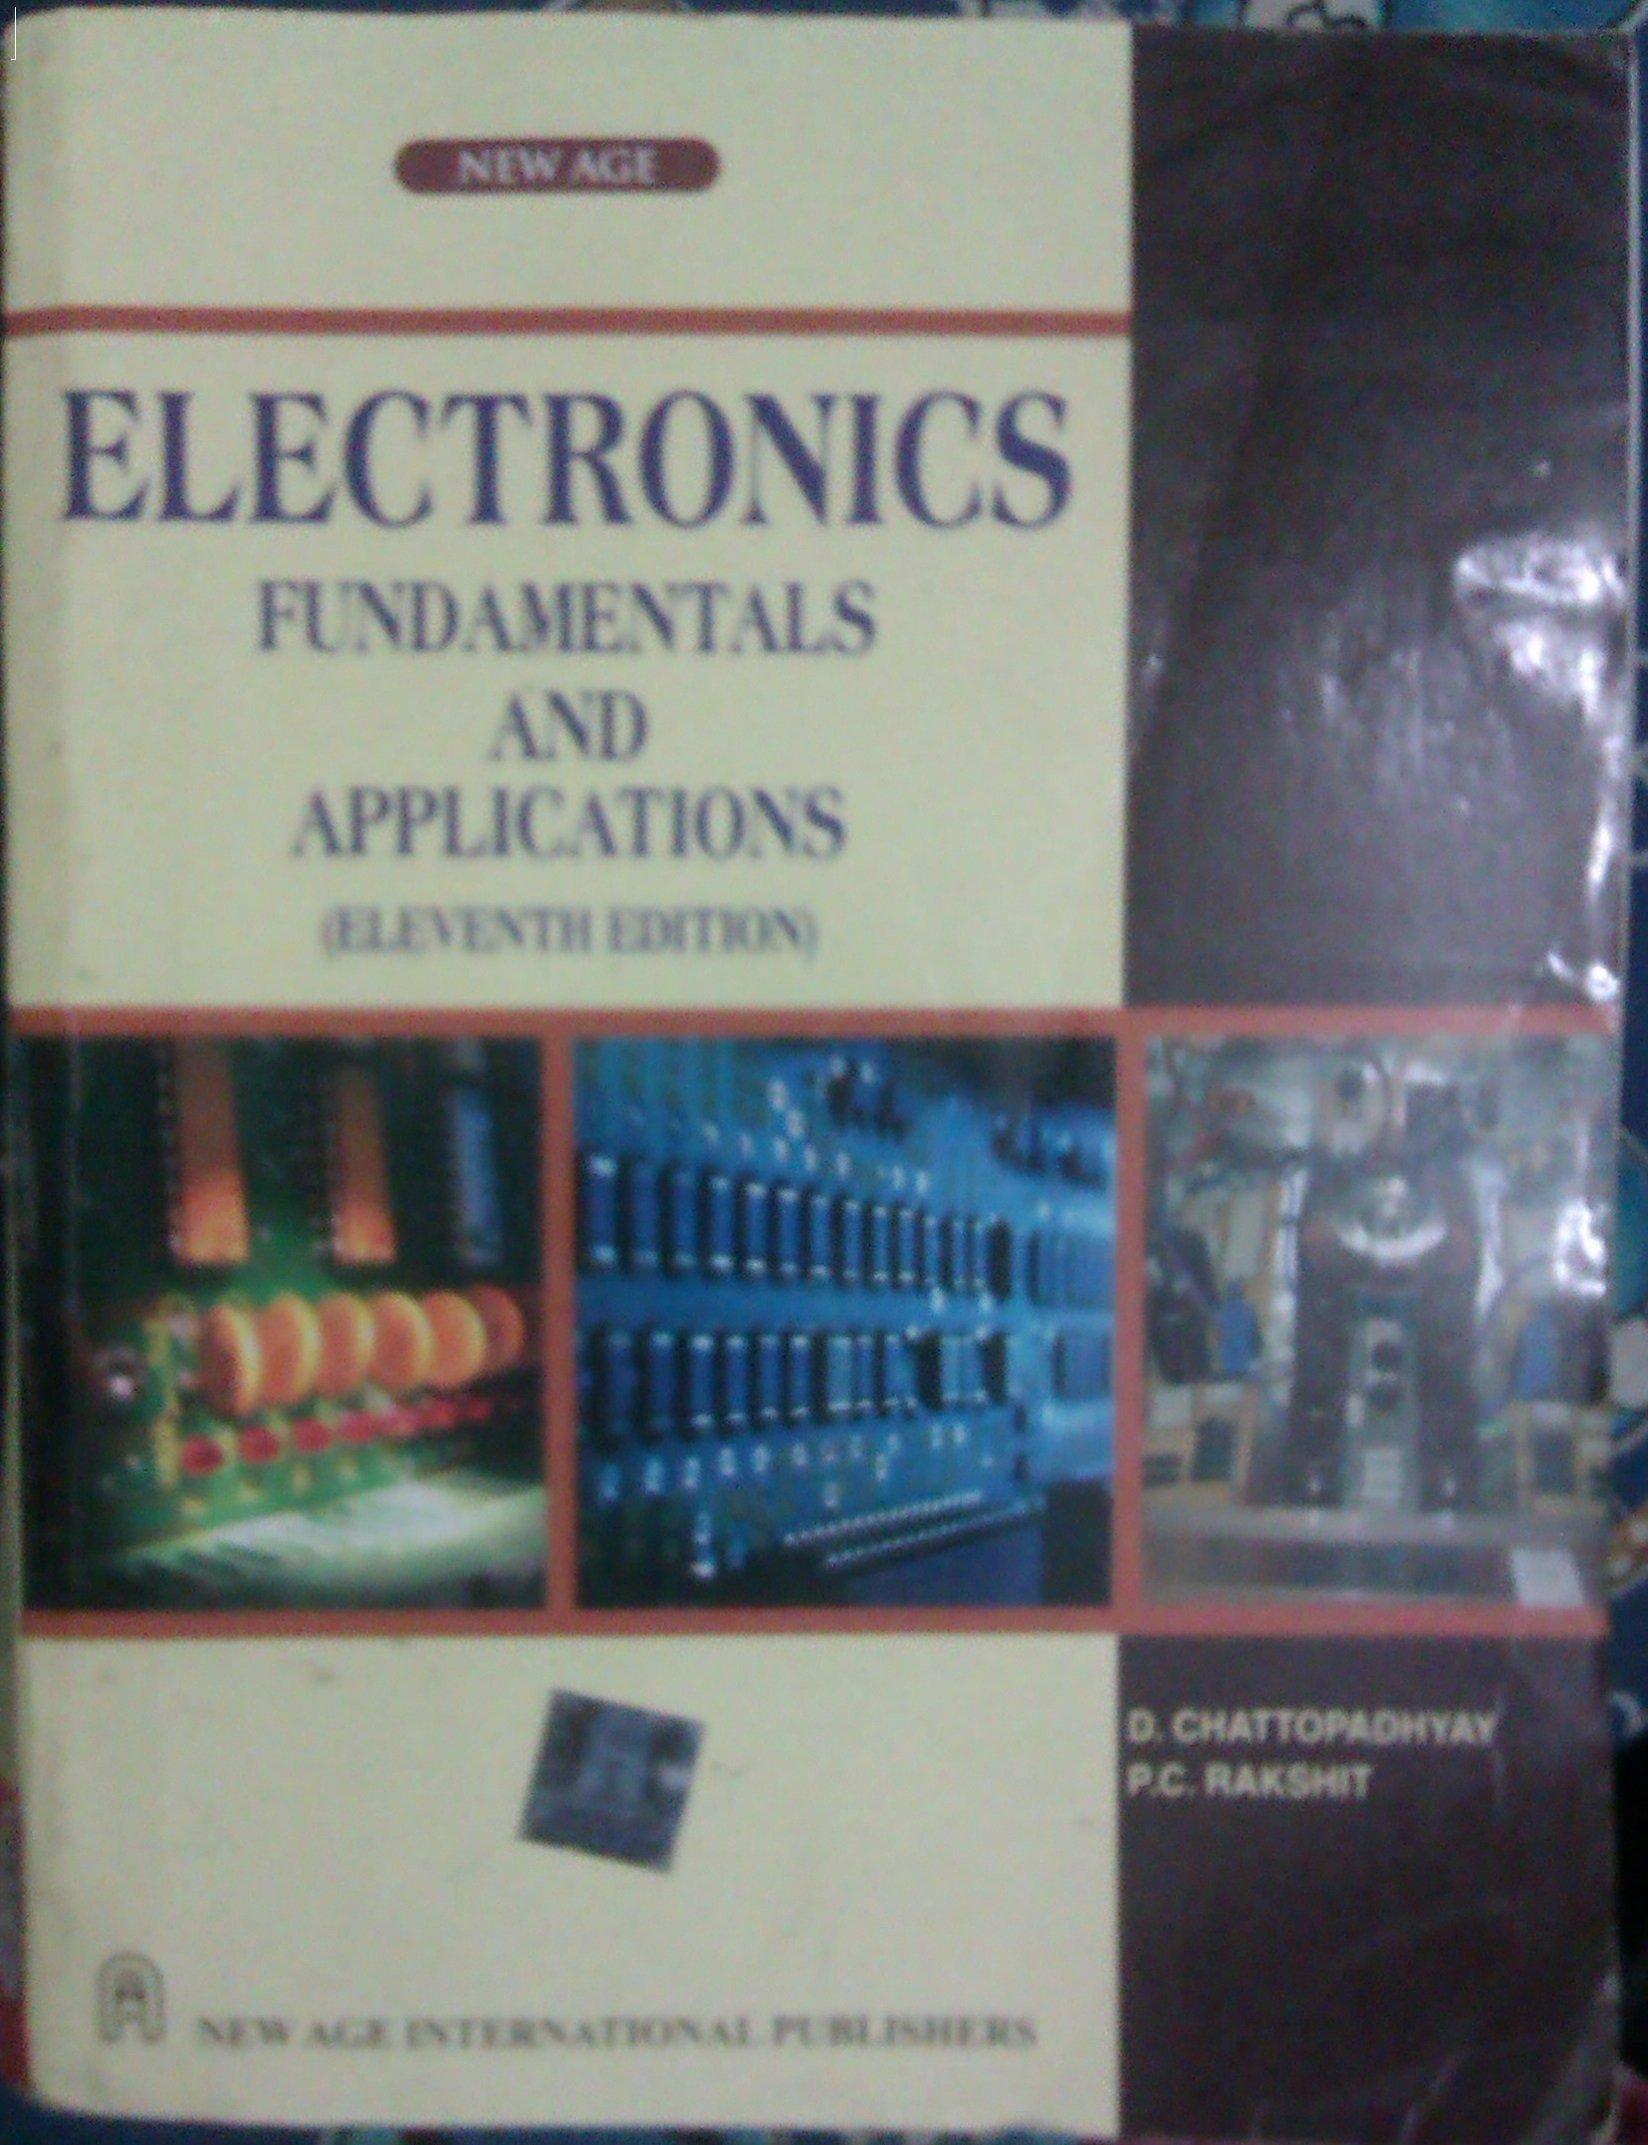 Electronics Fundamentals And Applications D Chattopadhyay P C Diac Rakshit 9788122431476 Books